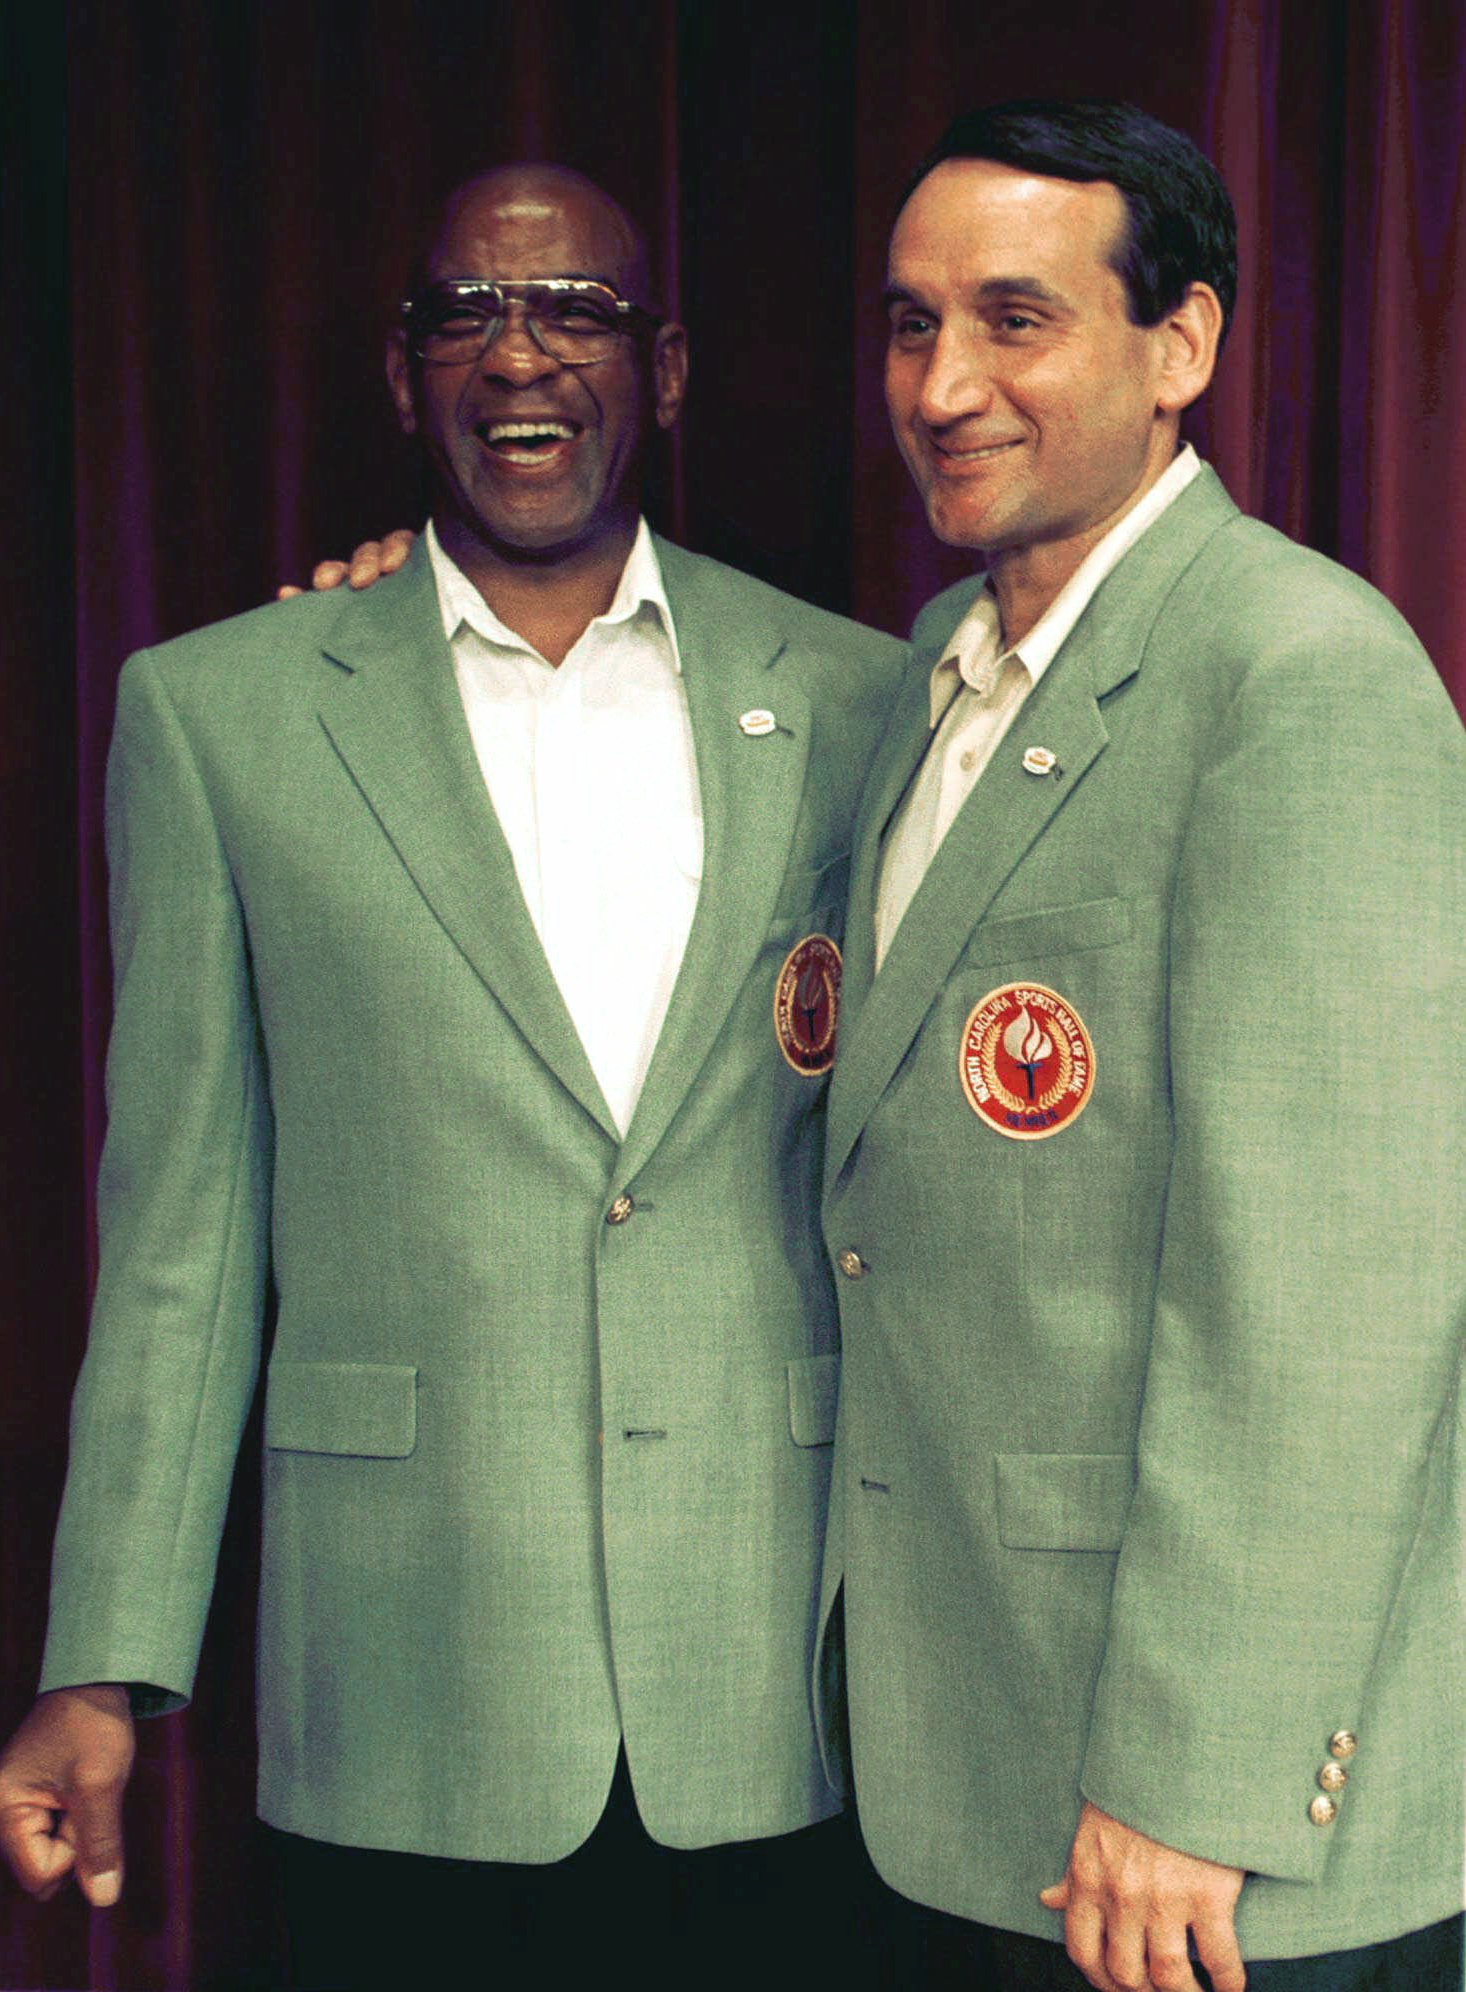 31eaeb42ce4 Duke basketball coach Mike Krzyzewski (right) embraces Henry Logan (left)